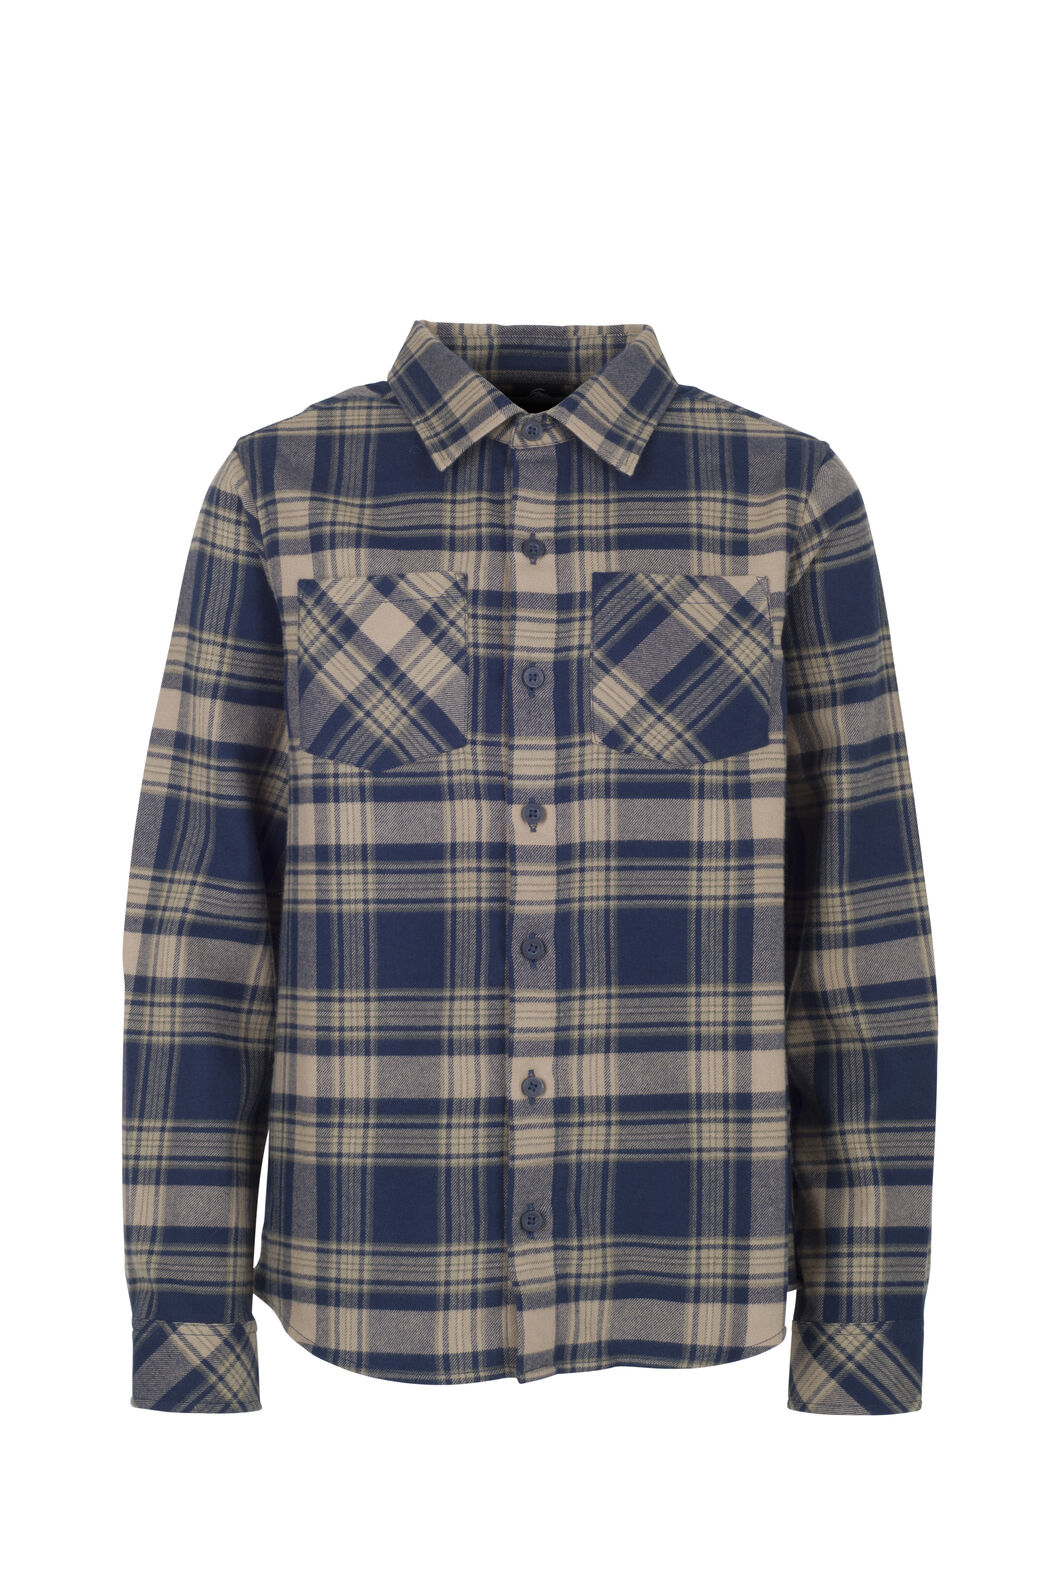 Macpac Milo Shirt - Kids', Salute/Grape Leaf, hi-res